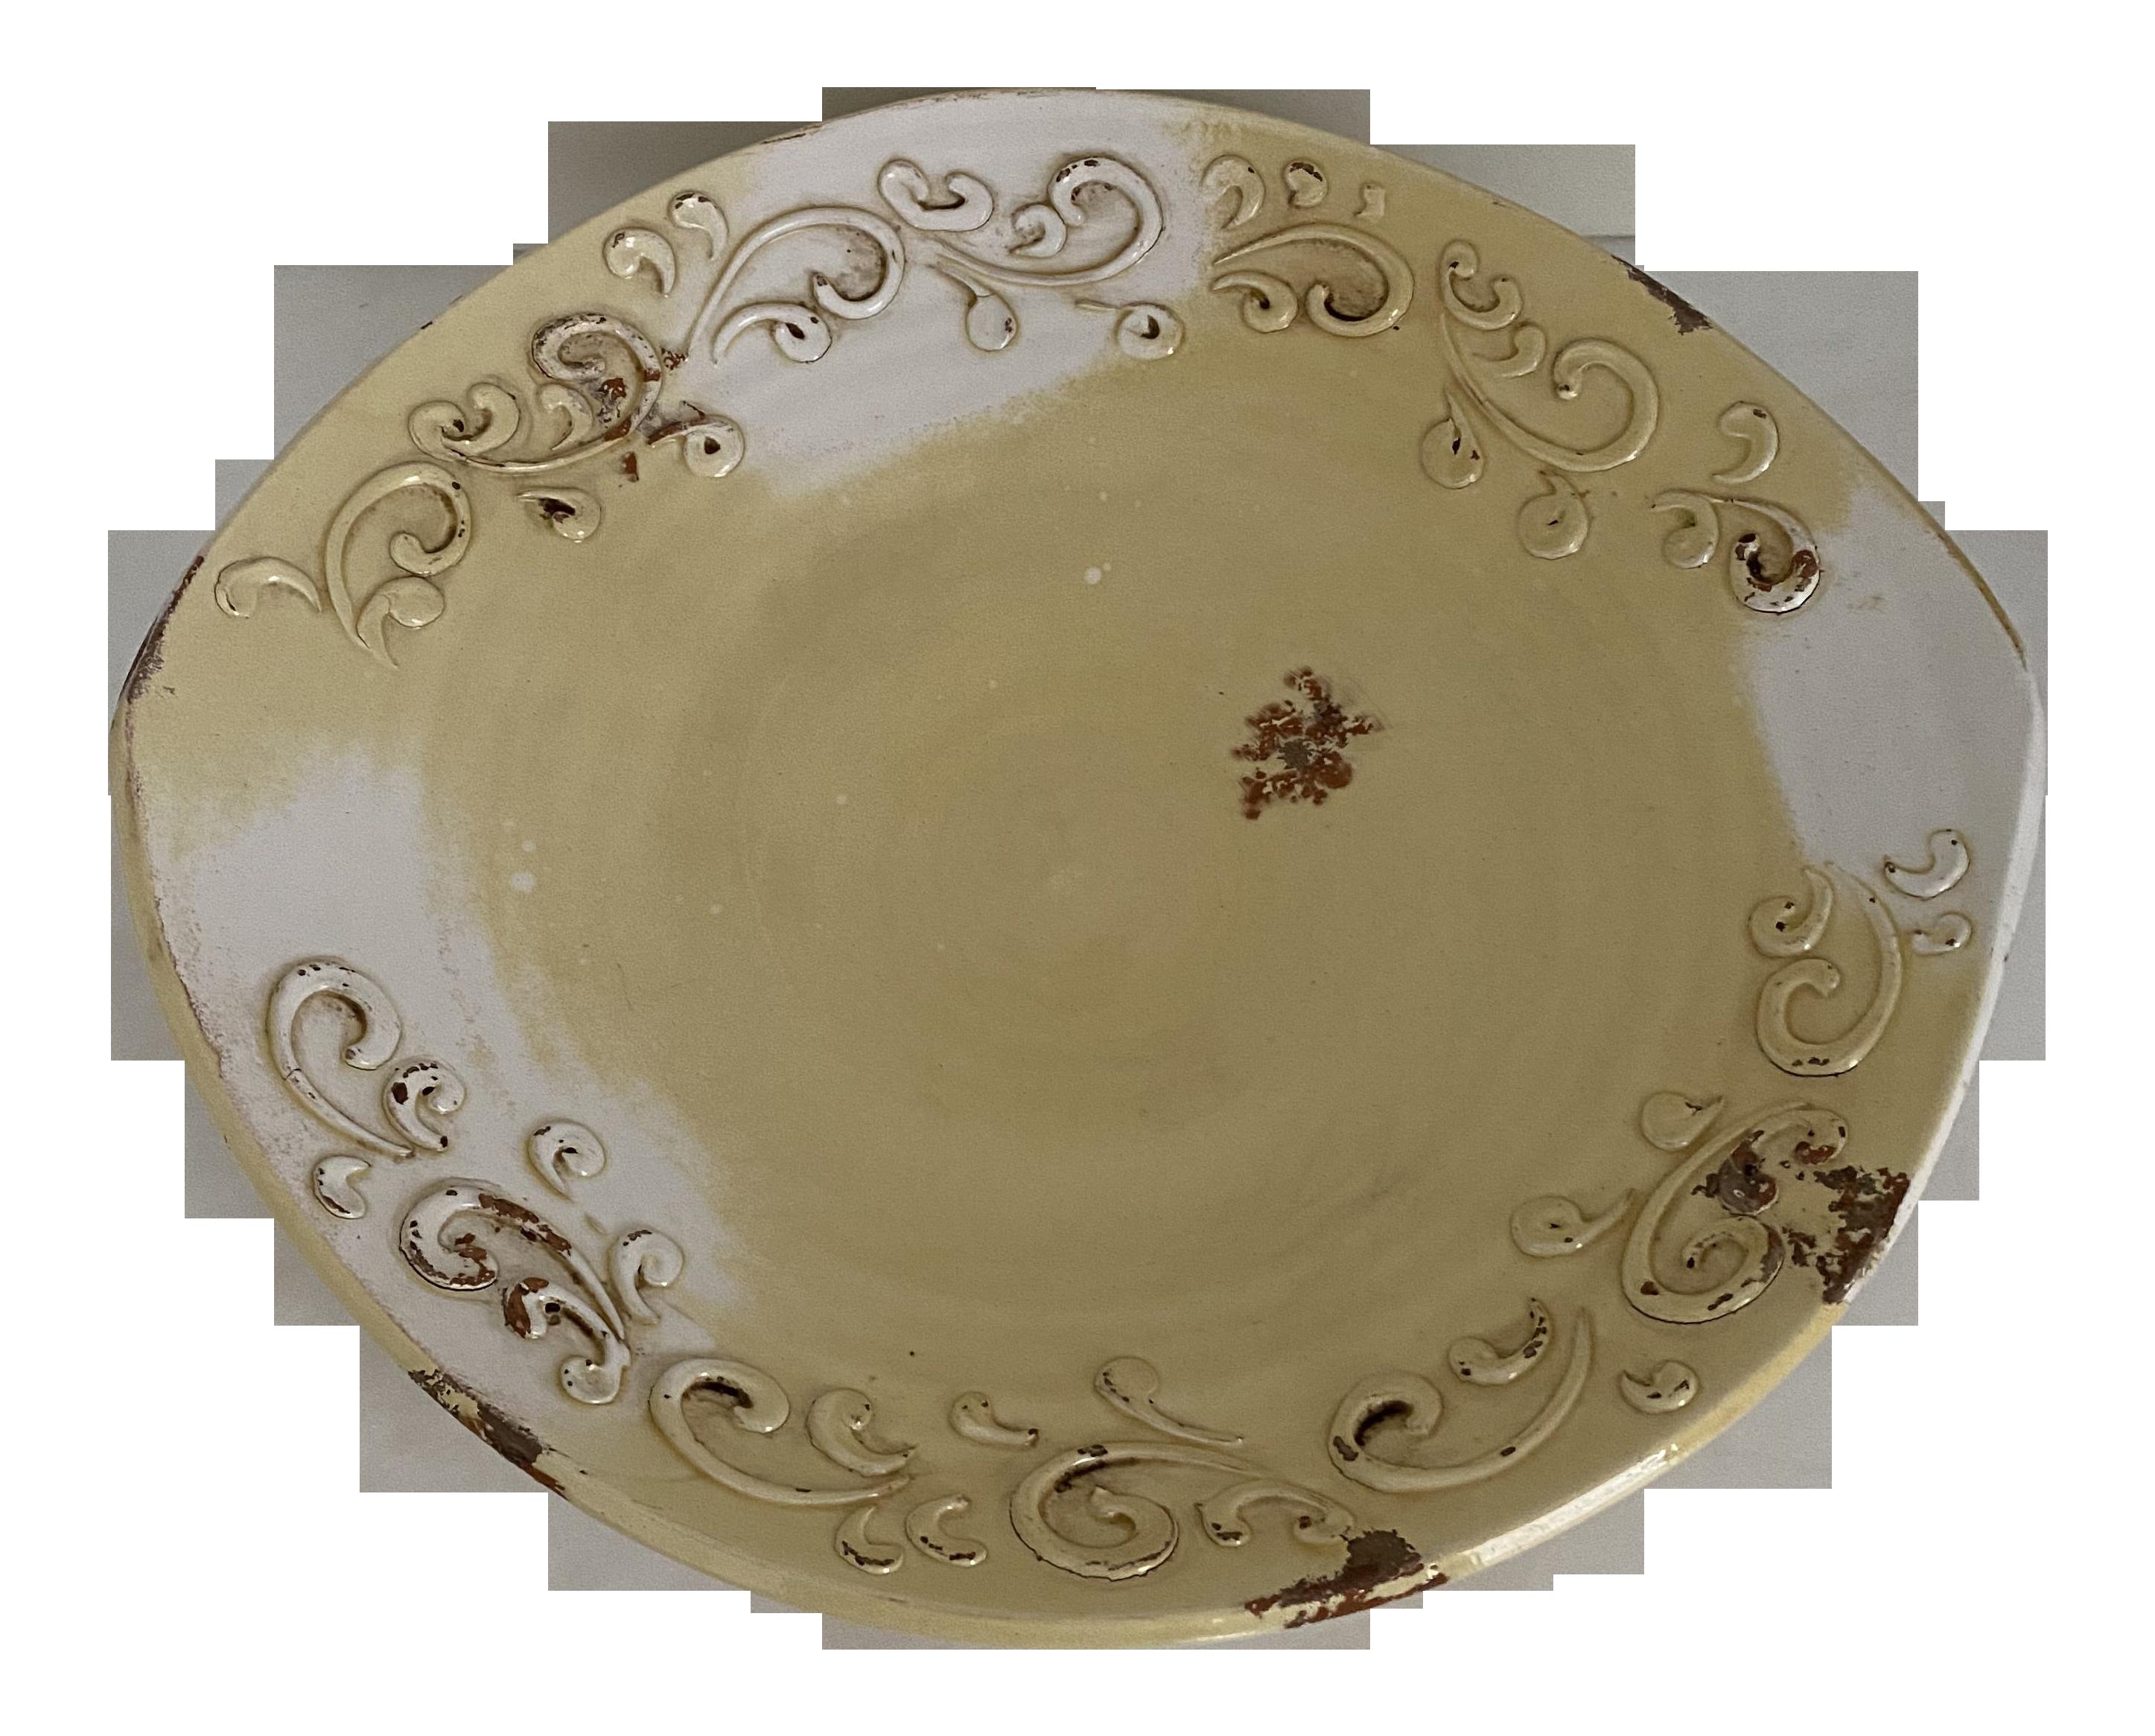 Handmade Large Decorative Ceramic Bowl From Italy Chairish